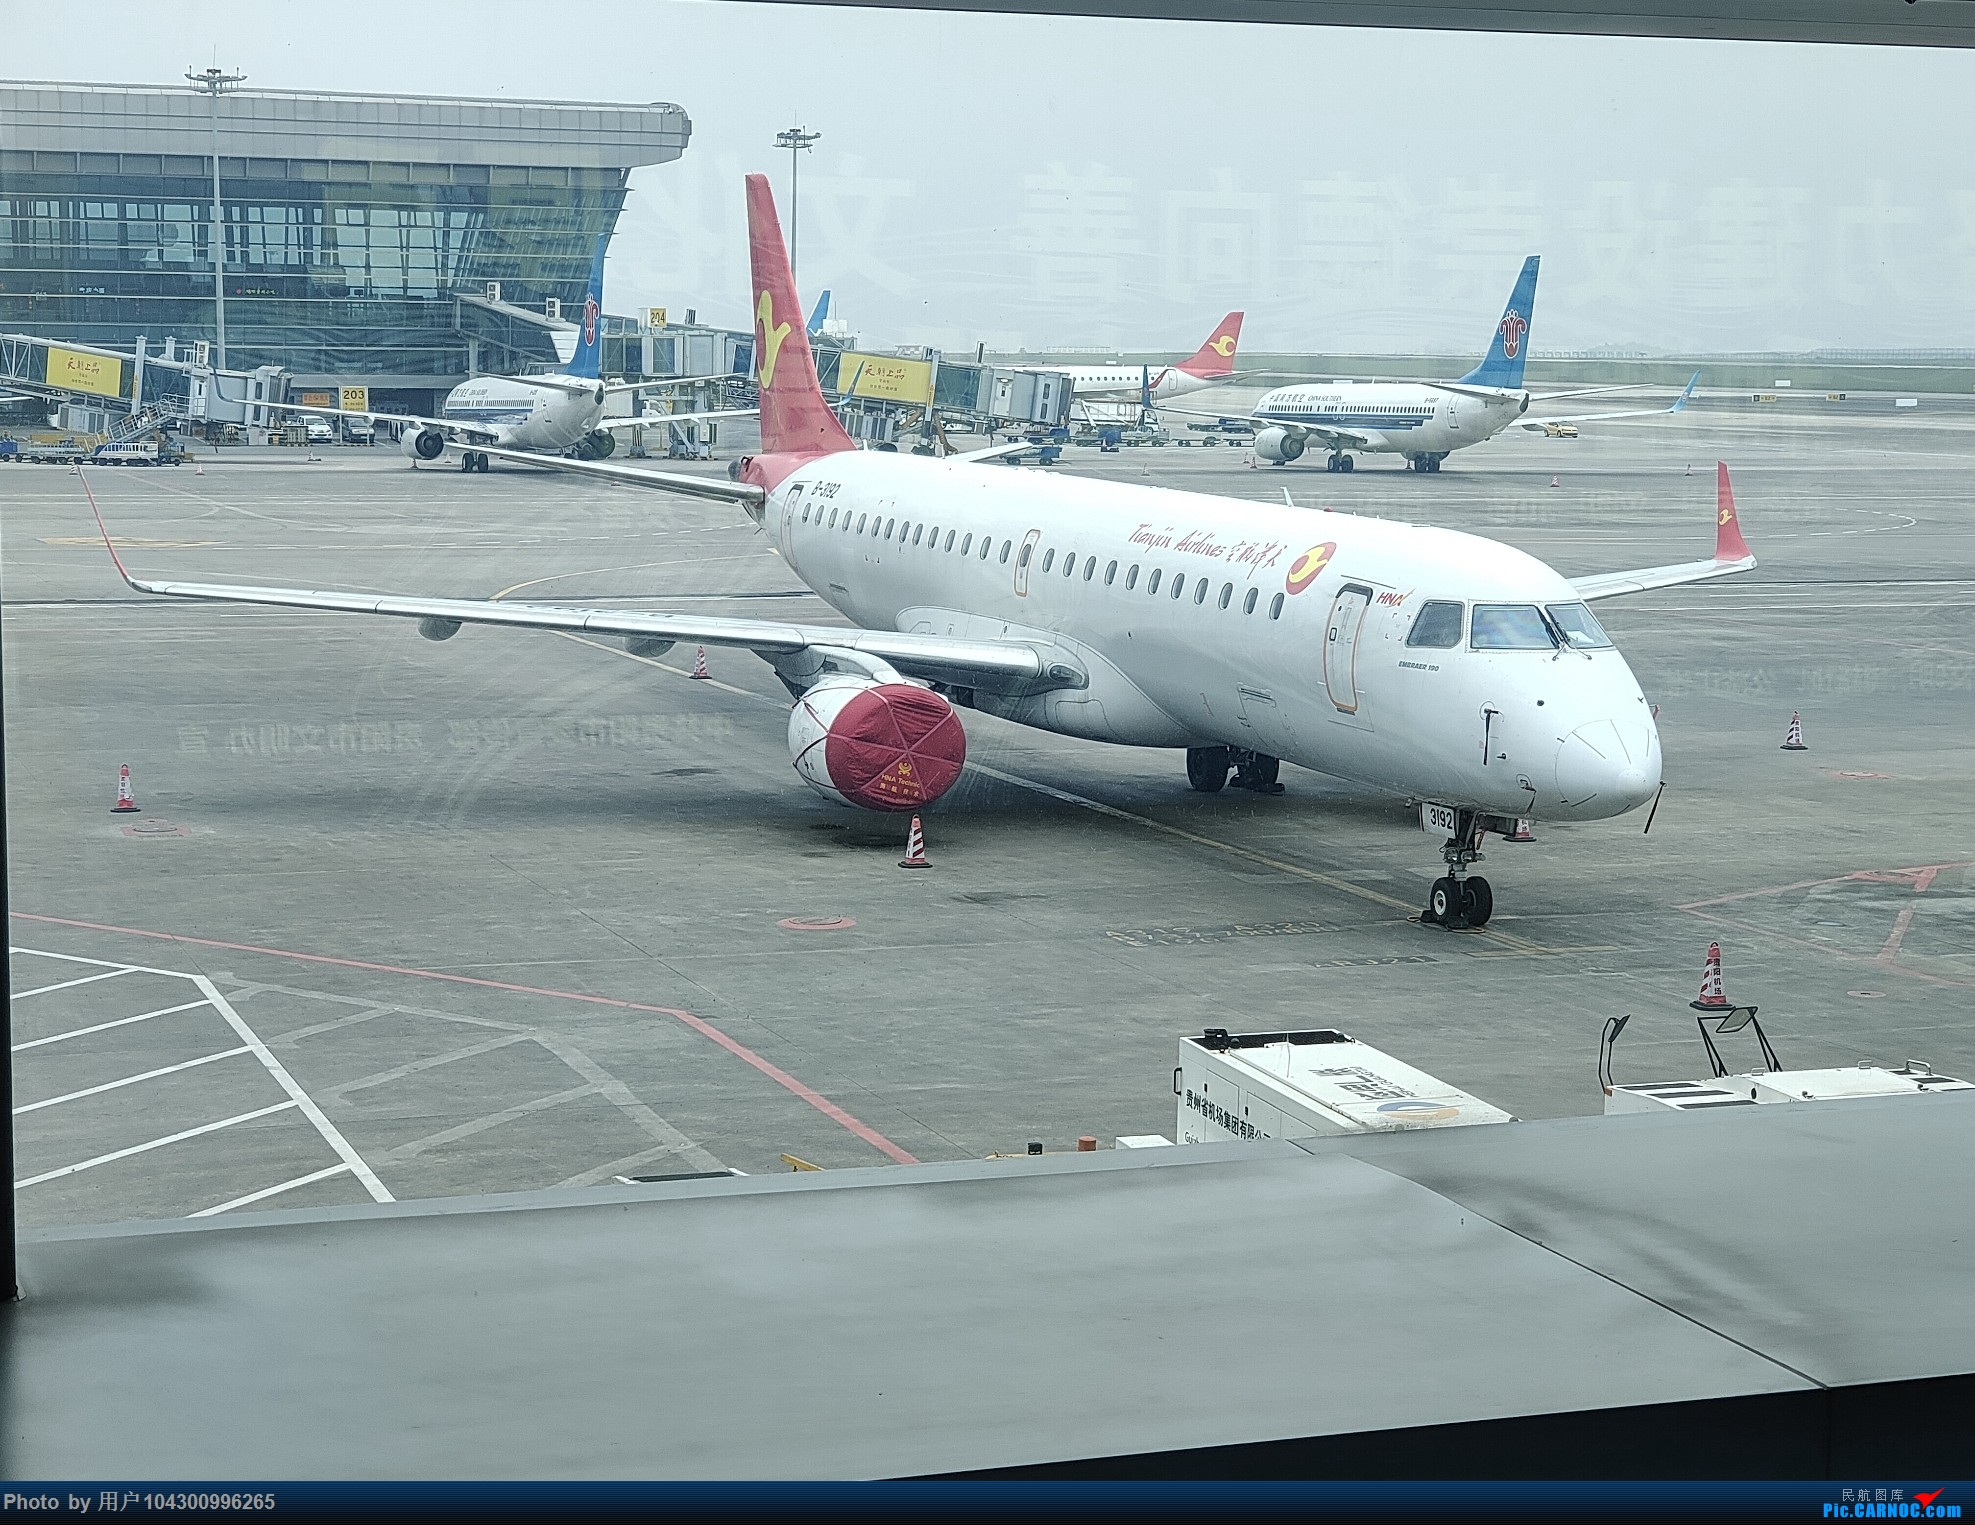 Re:[原创]DM游记之GY贵阳-成都往返(参观空港花田) EMBRAER E-190 B-3192 中国贵阳龙洞堡国际机场